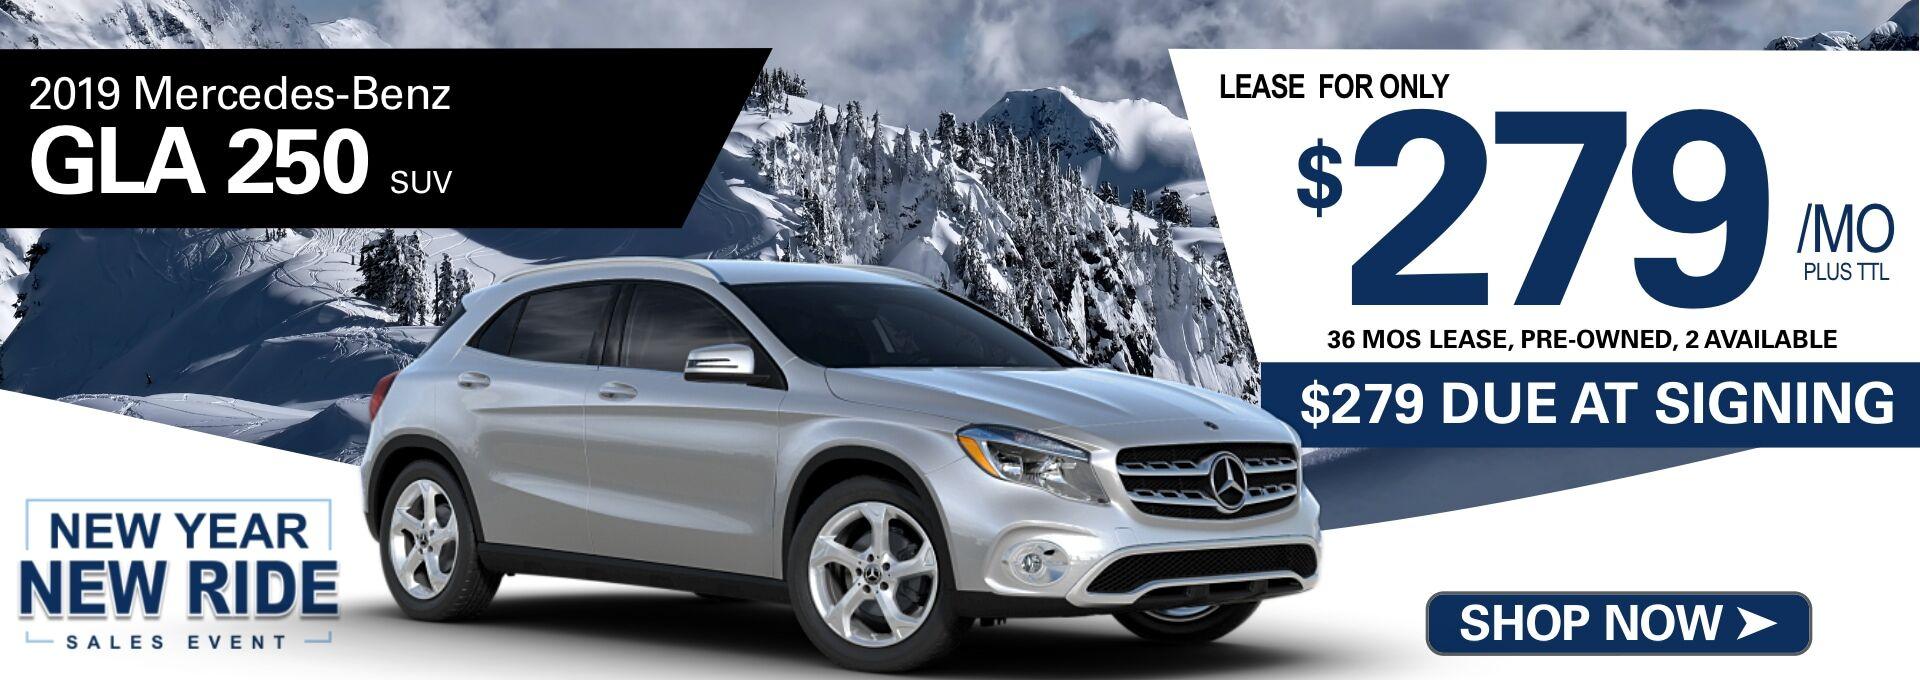 Mercedes South Atlanta >> Mercedes Benz Dealership Atlanta Ga Pre Owned Cars